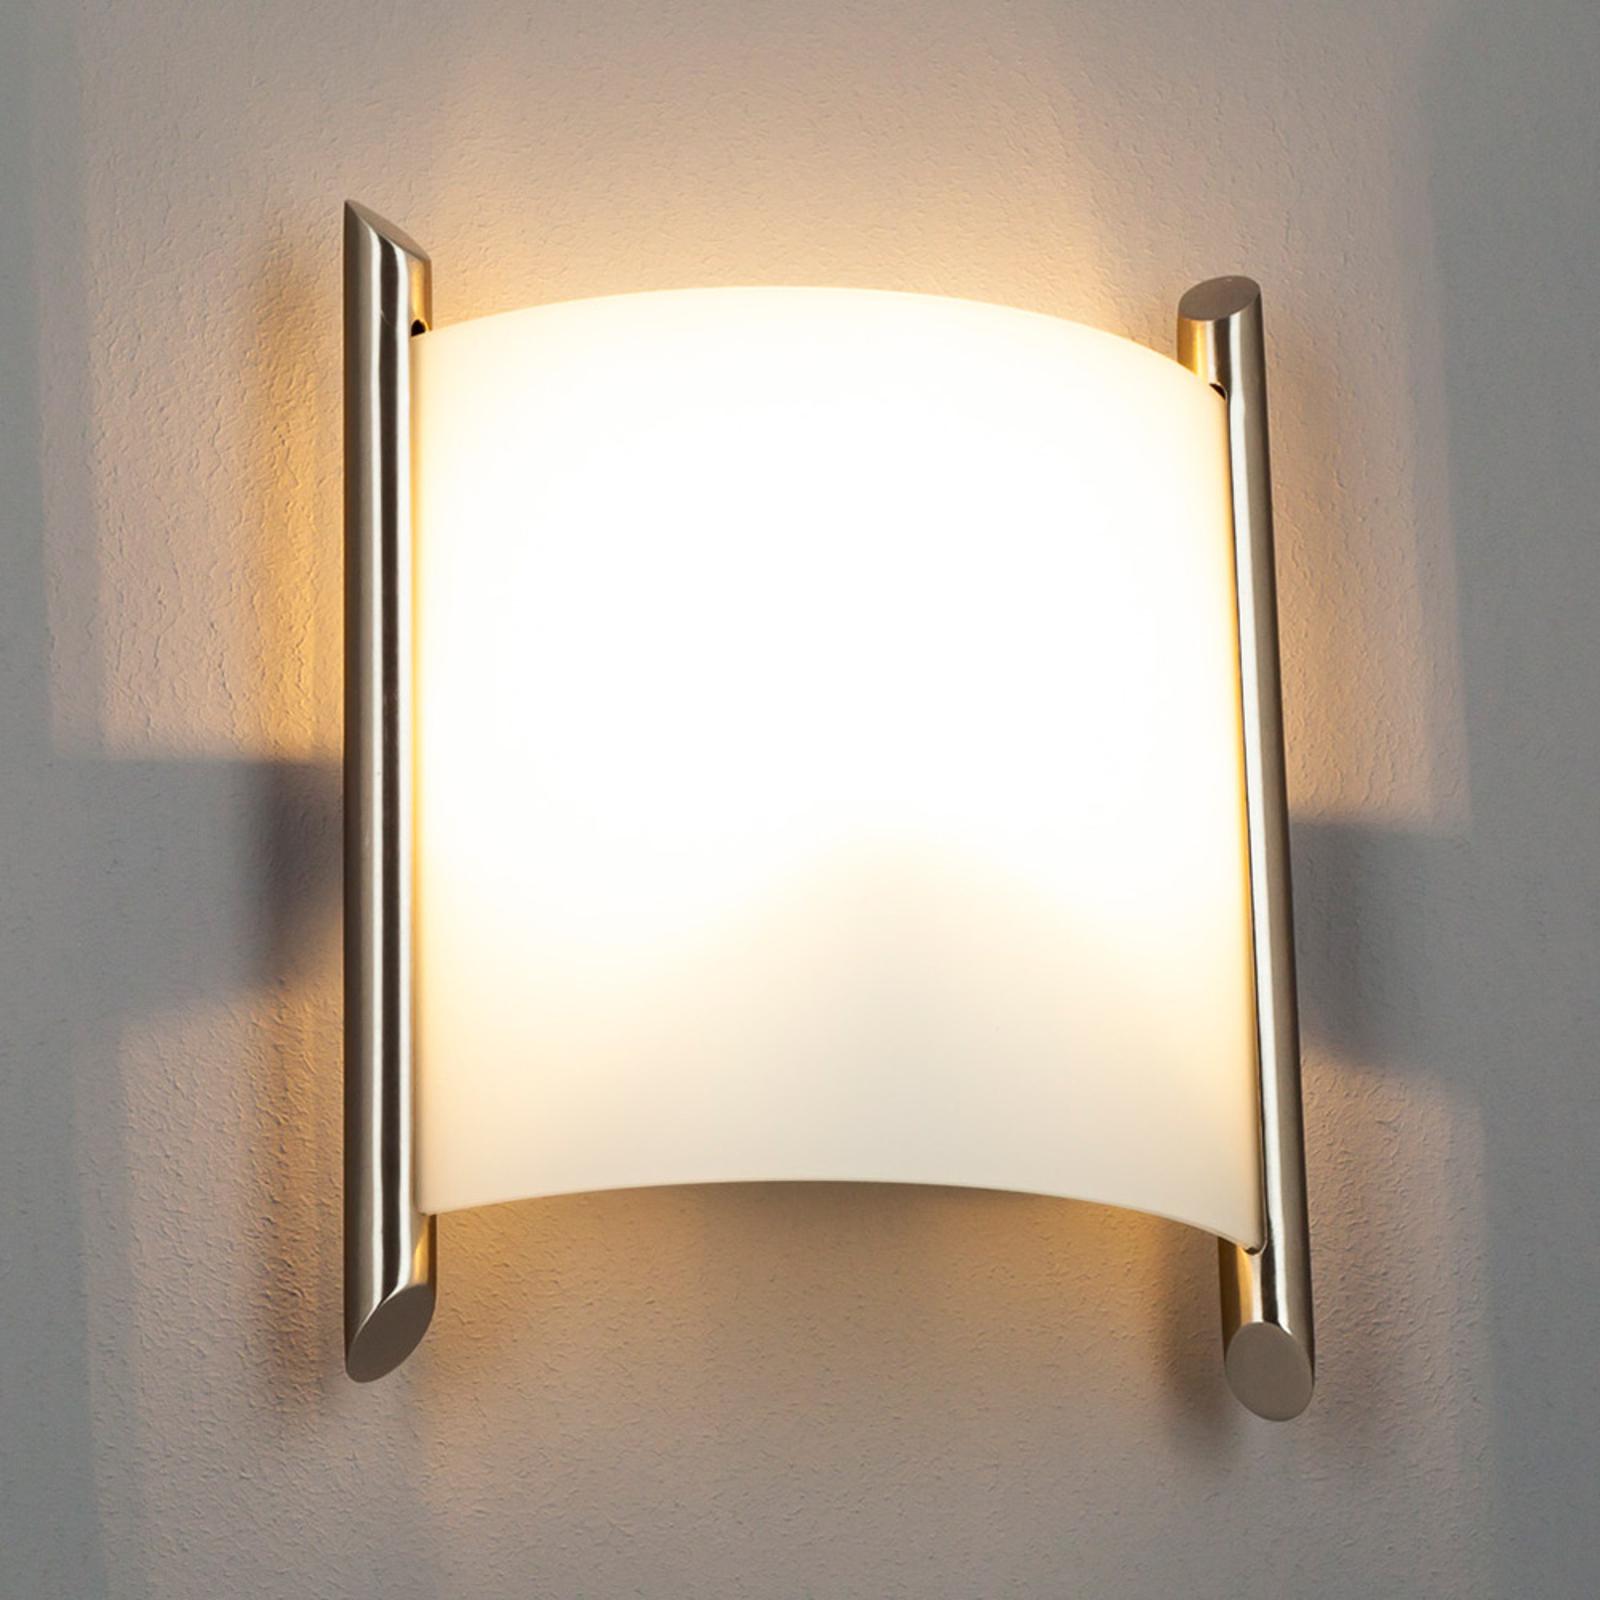 Filippa wandlamp, 20 cm, nikkel gesatineerd